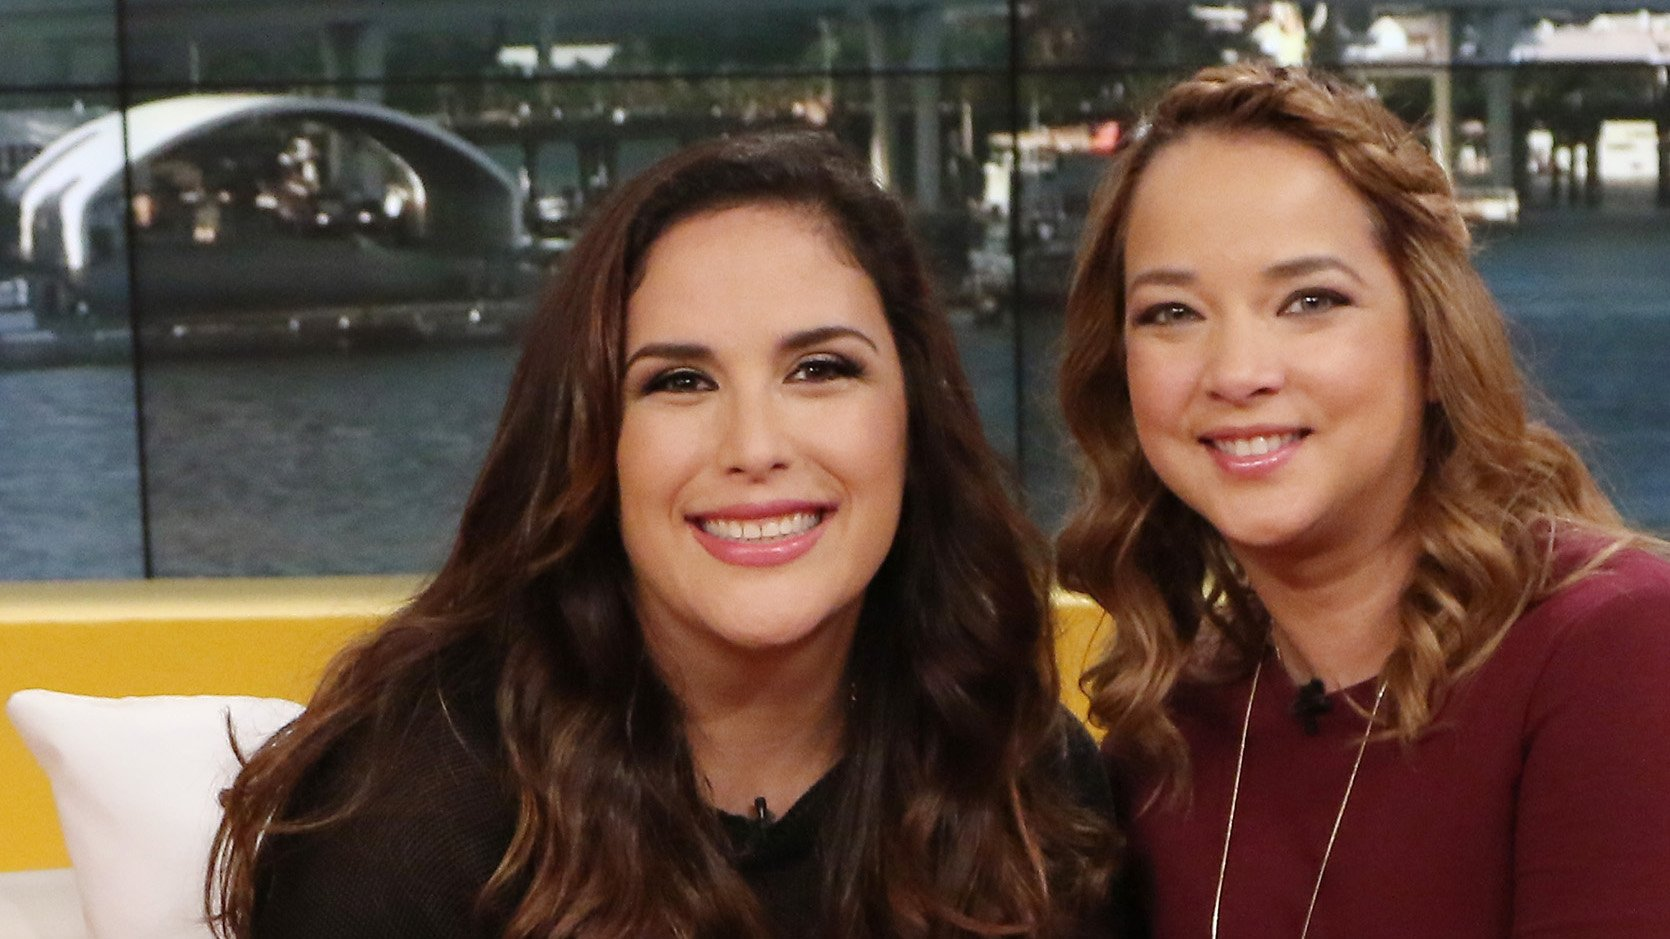 "MIAMI, FL - OCTOBER 27: Angelica Vale and Adamari Lopez are seen on the set of ""Un Nuevo Dia"" at Telemundo Studios on October 27, 2015 in Miami, Florida. (Photo by Alexander Tamargo/Getty Images)"